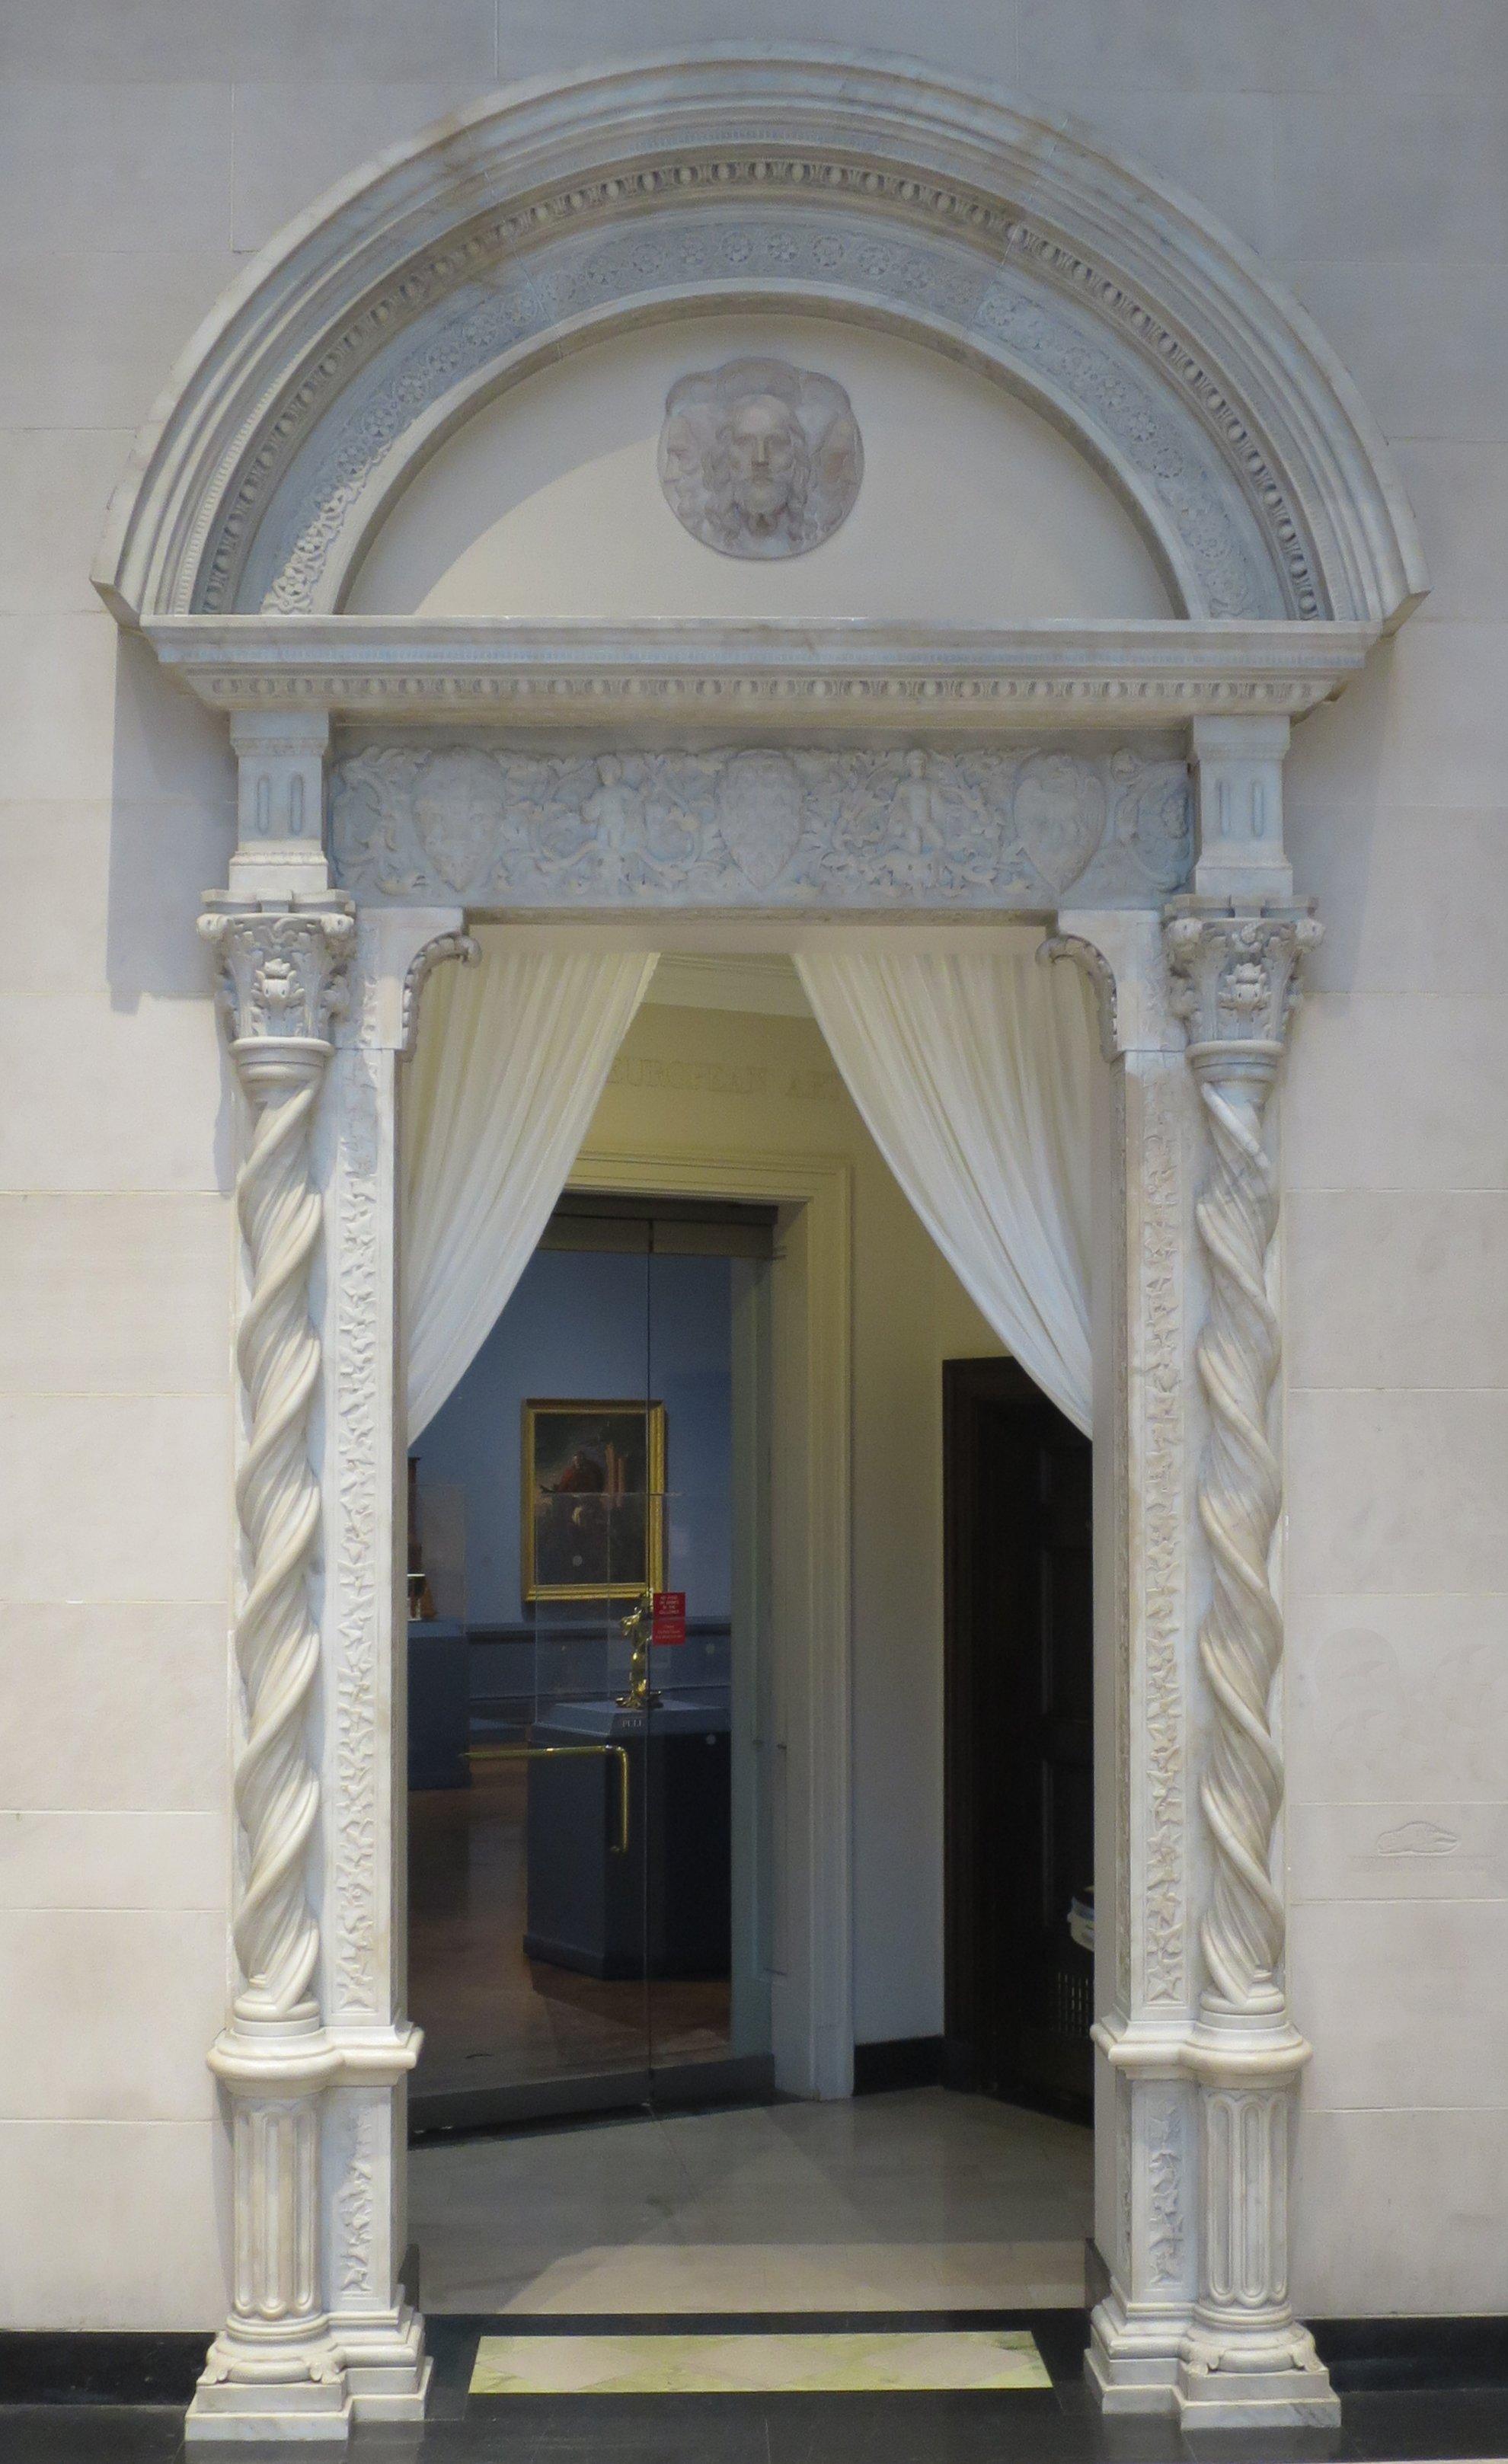 File:Door frame by Louis J. P. Lott, c. 1930, Dayton Art Institute ...